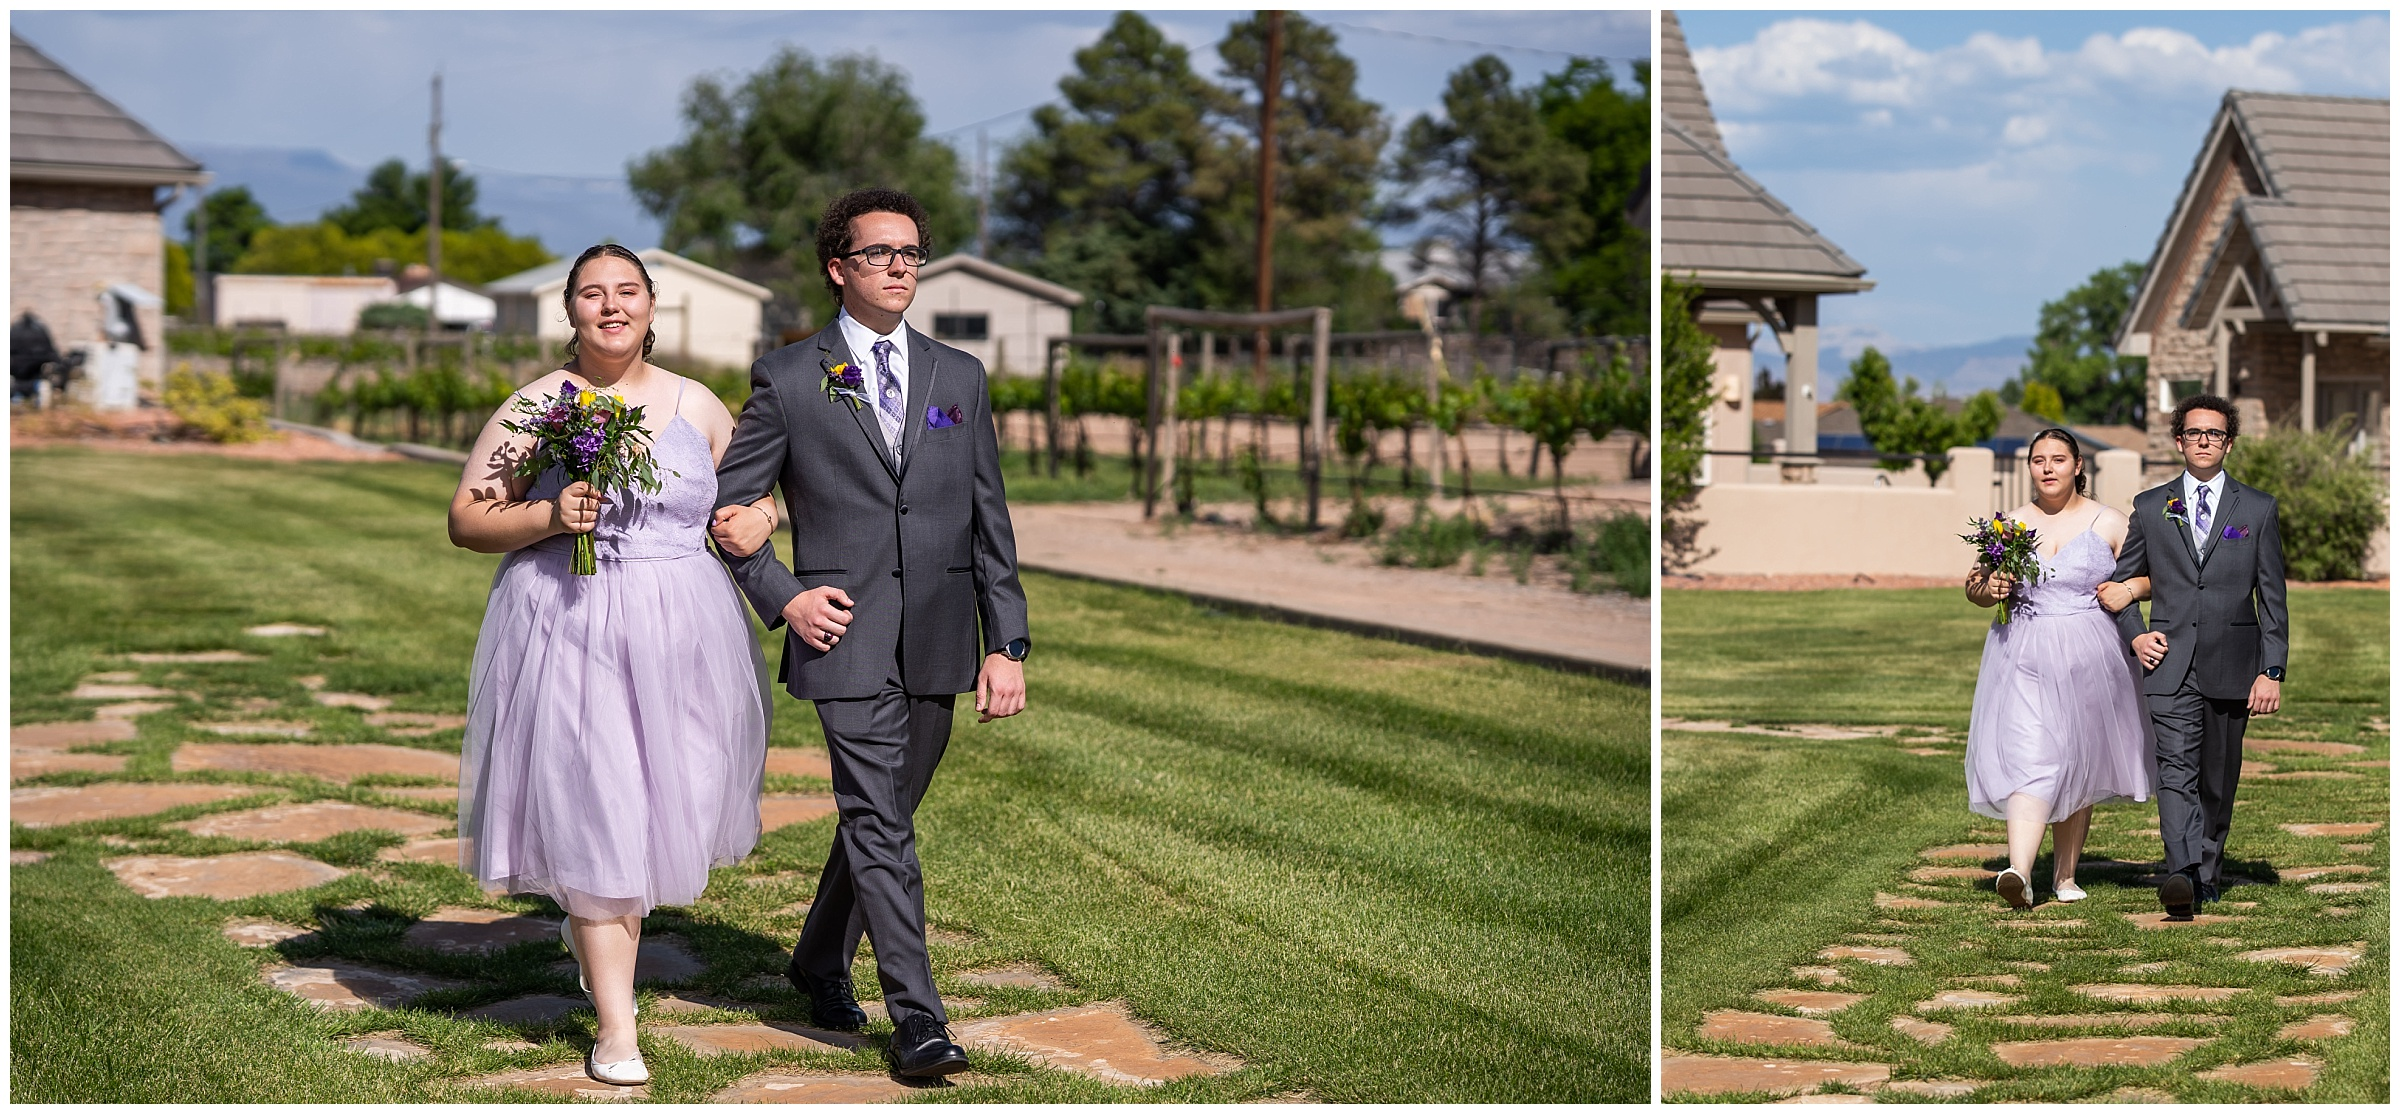 Grand Junction Wedding Photographer 0033.jpg